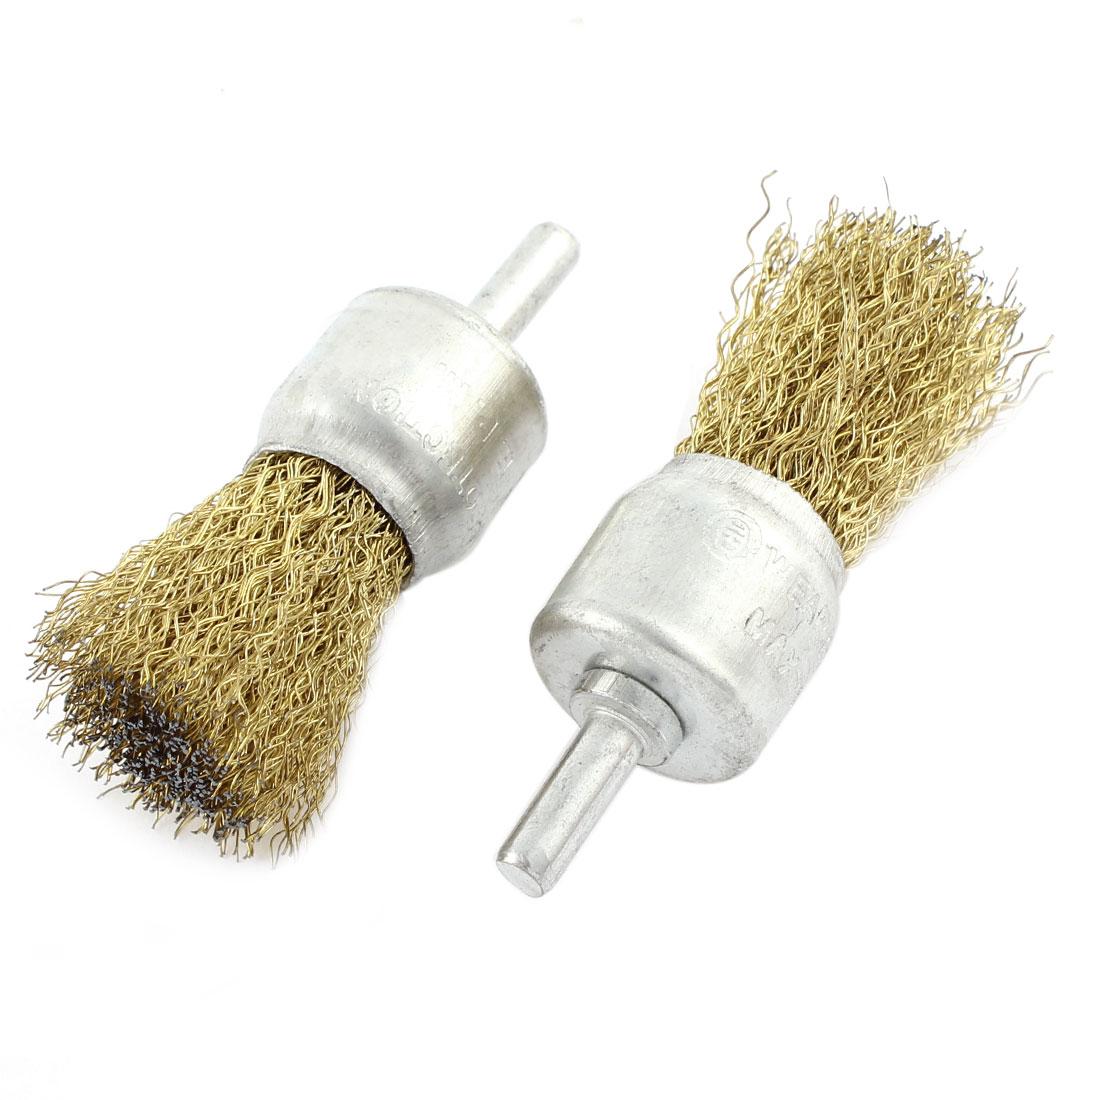 2pcs 24 x 30mm Steel Wire Pen Shape Polishing Grinding Brush Rotary Tool